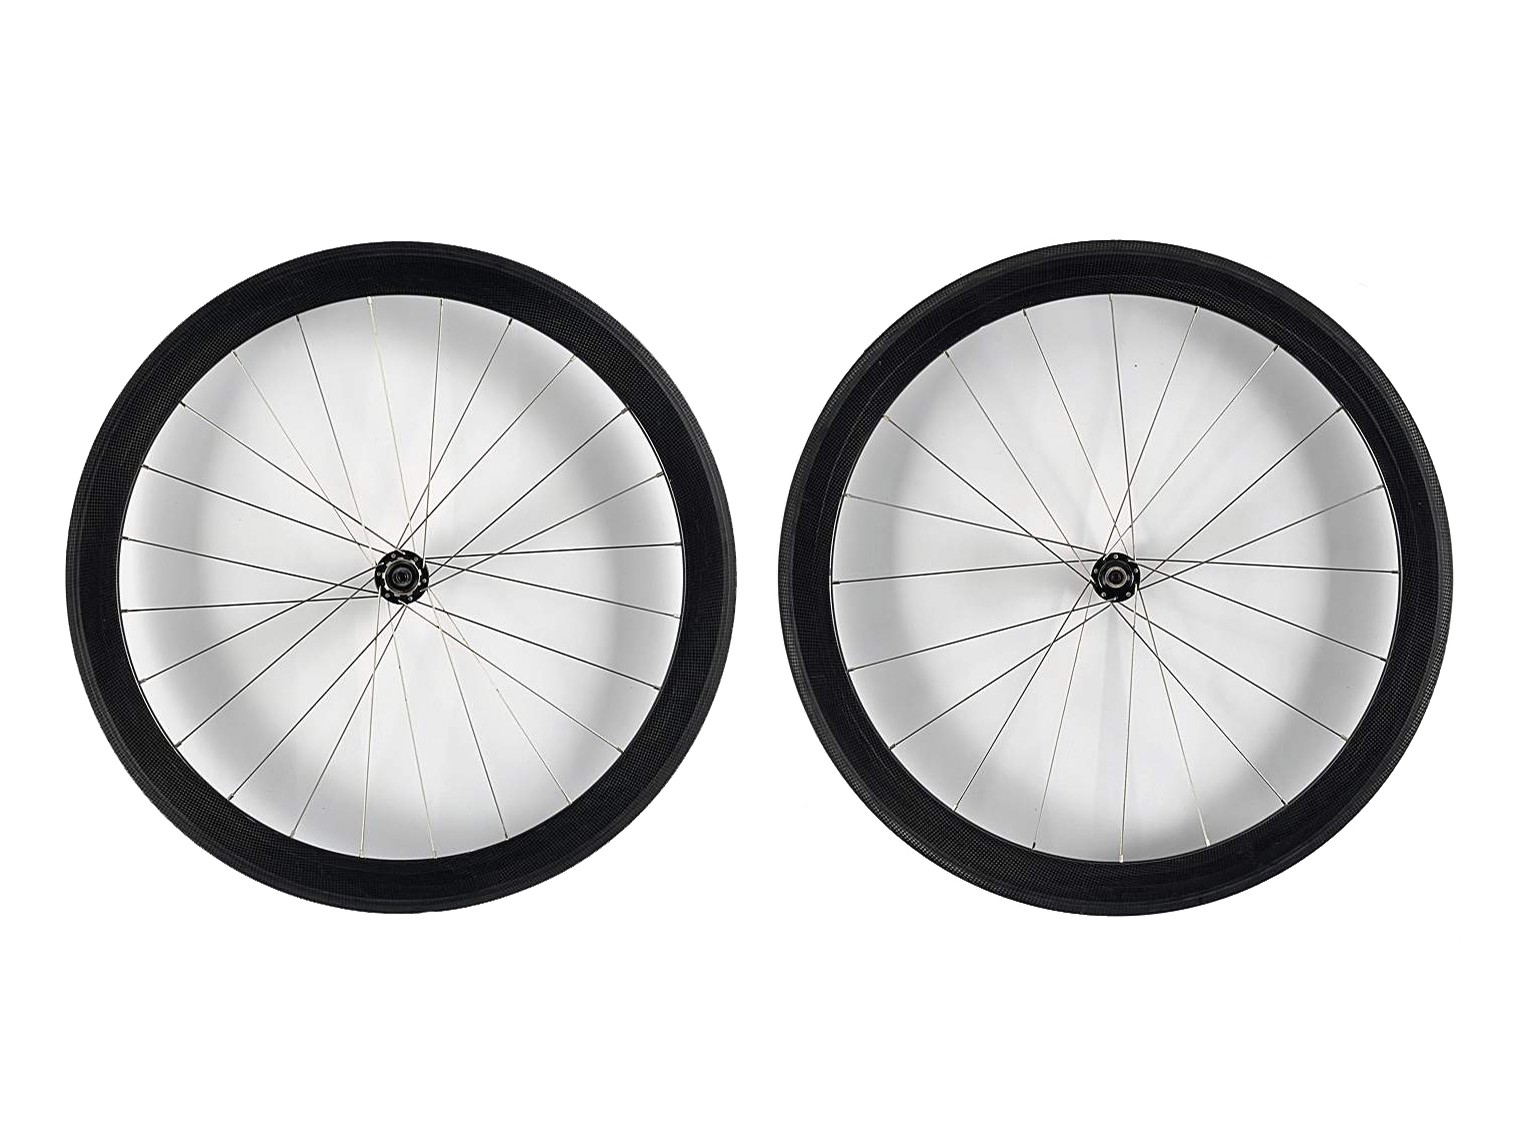 Planet X Pro Carbon Tubular 50mm wheelset